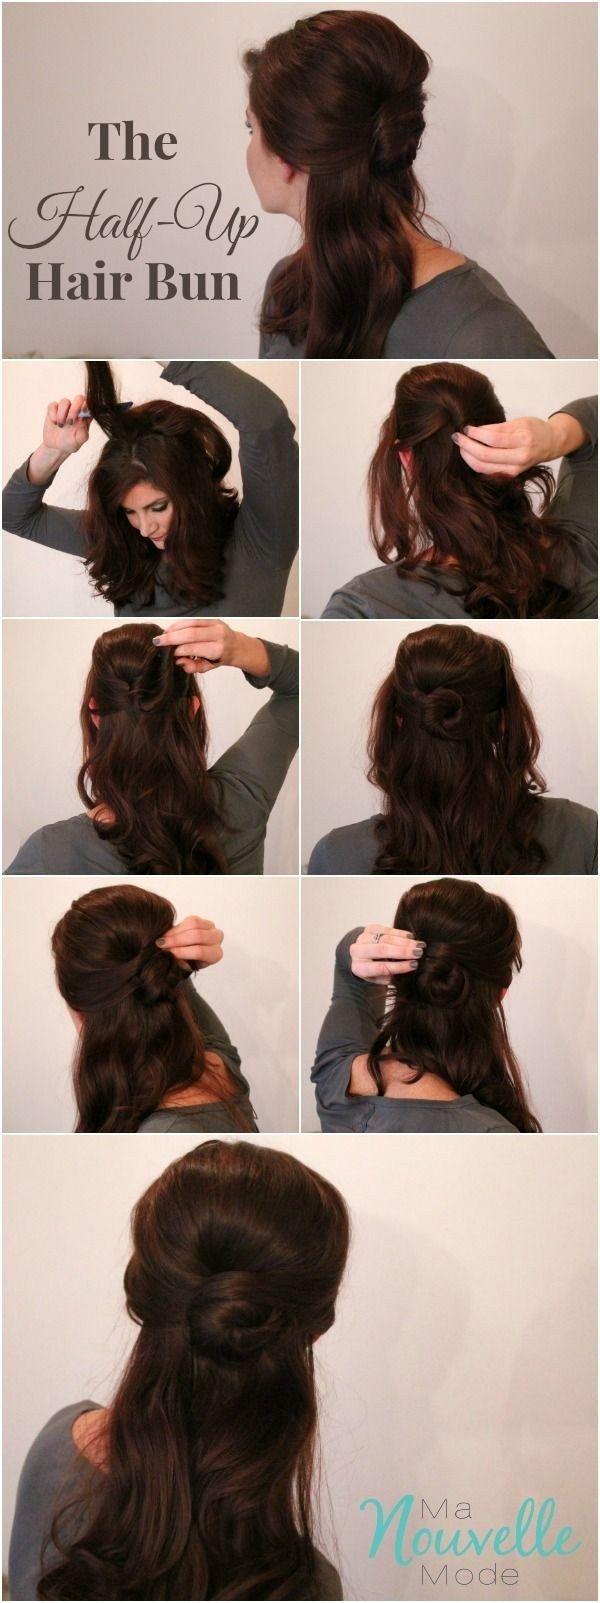 Trendy braided hairstyle tutorial easy hair tutorials easy hair